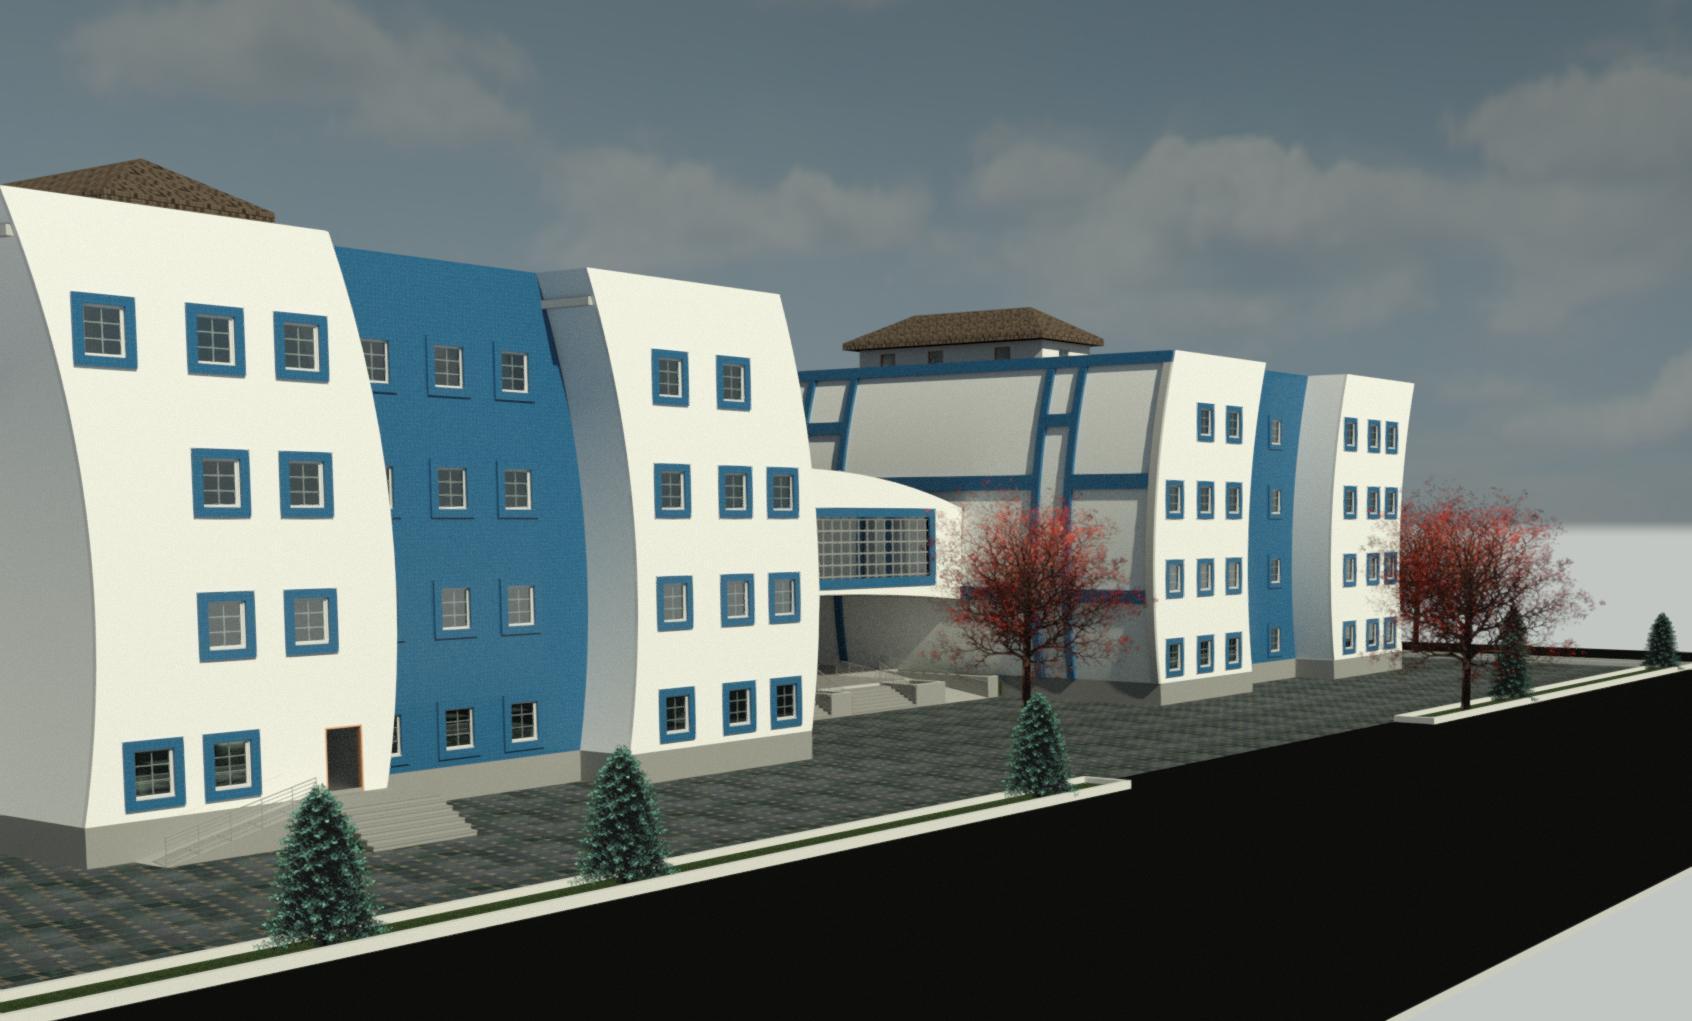 پلان کامل بیمارستان ( اتوکد - رندر - رویت )